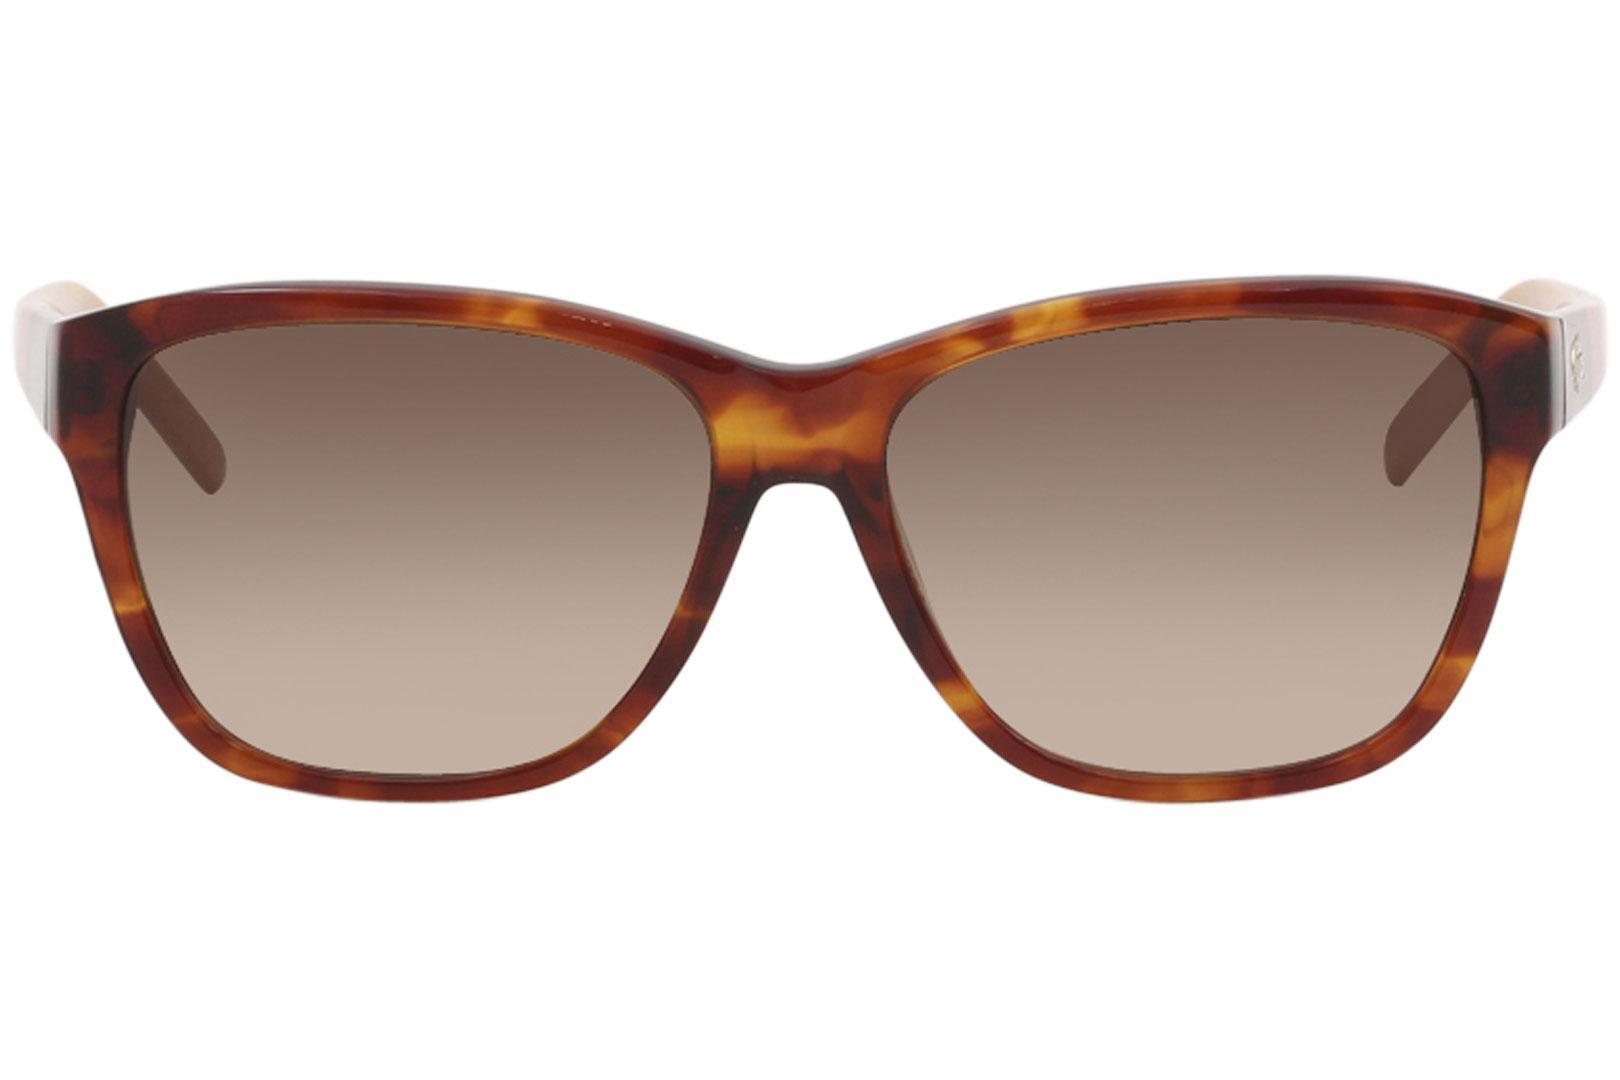 15c69149b7 Lacoste Women s L658S L 658 S Fashion Square Sunglasses by Lacoste